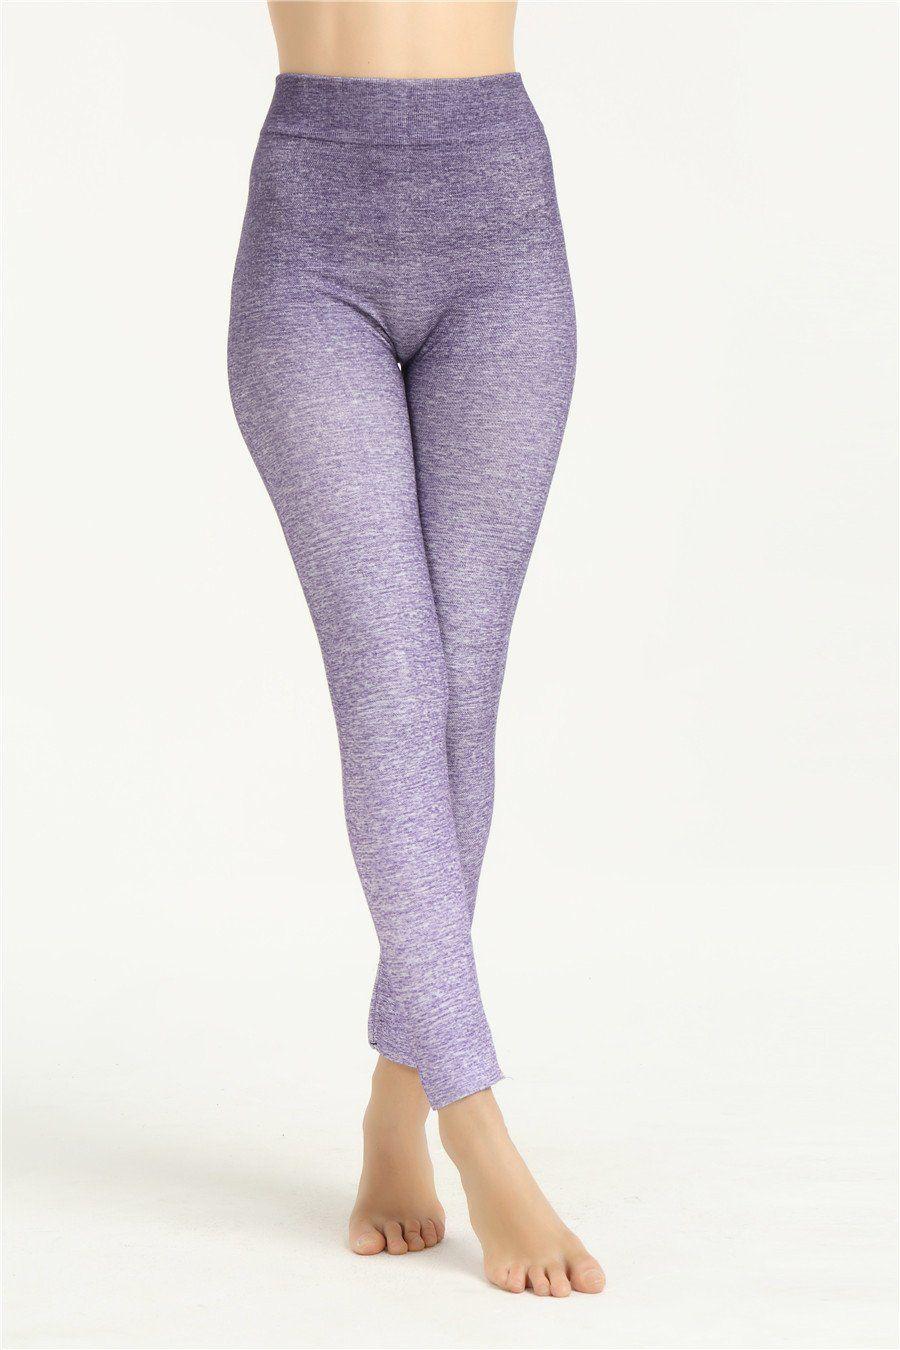 a662f0ed323ea Push Up Leggings Women Workout Leggings Slim Leggings Polyester V-Waist Jeggings  Women Pencil Pants